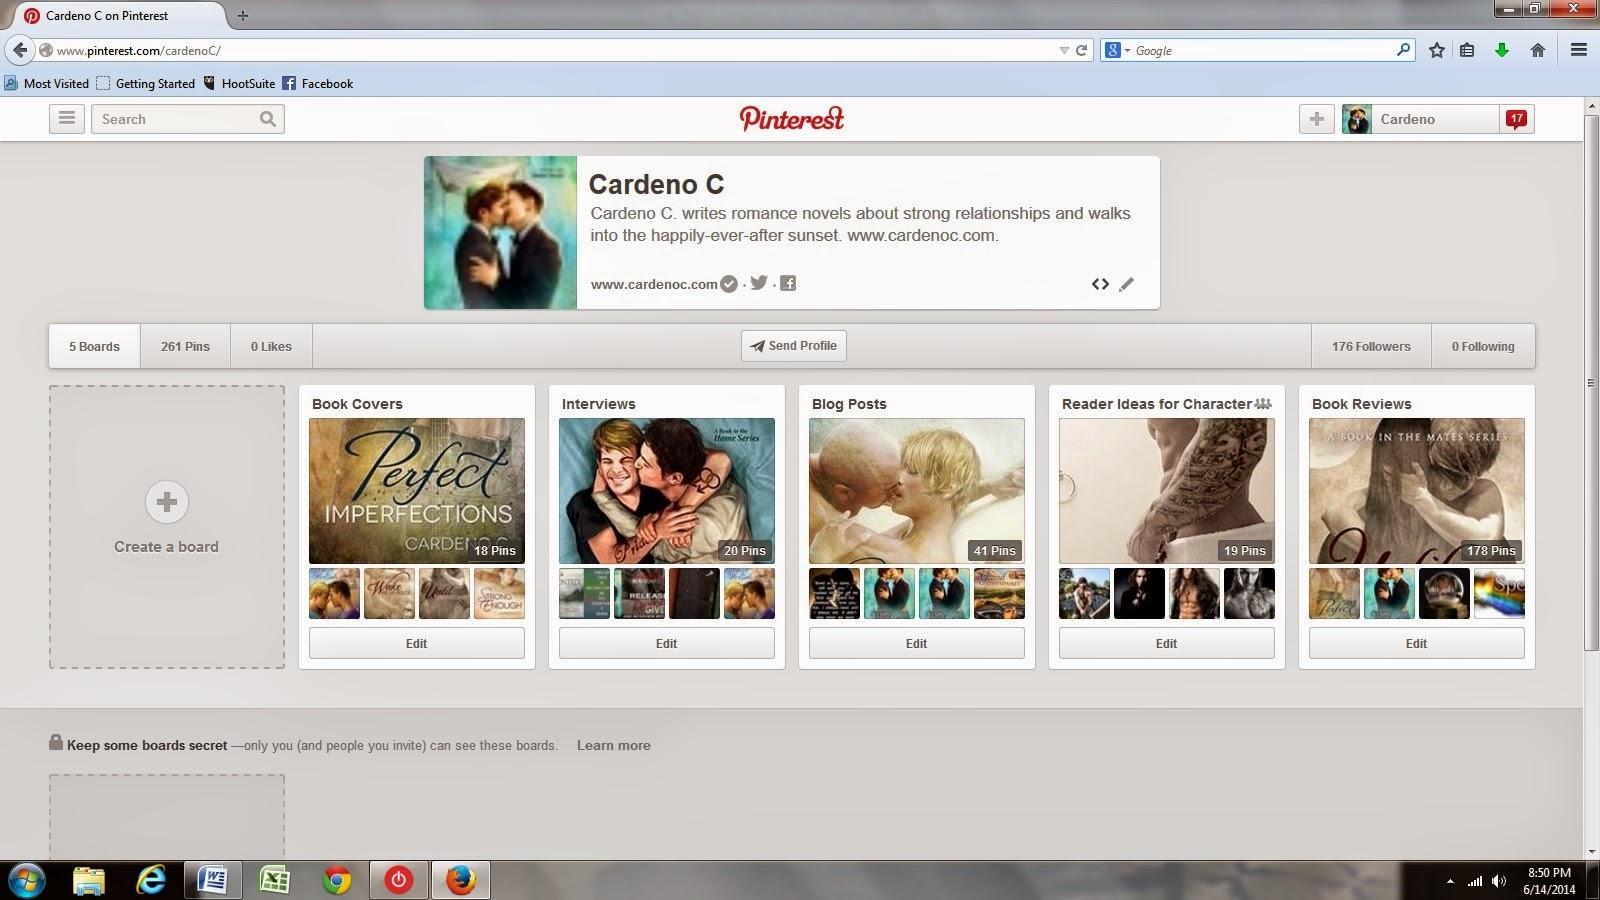 Cardeno C. on Pinterest